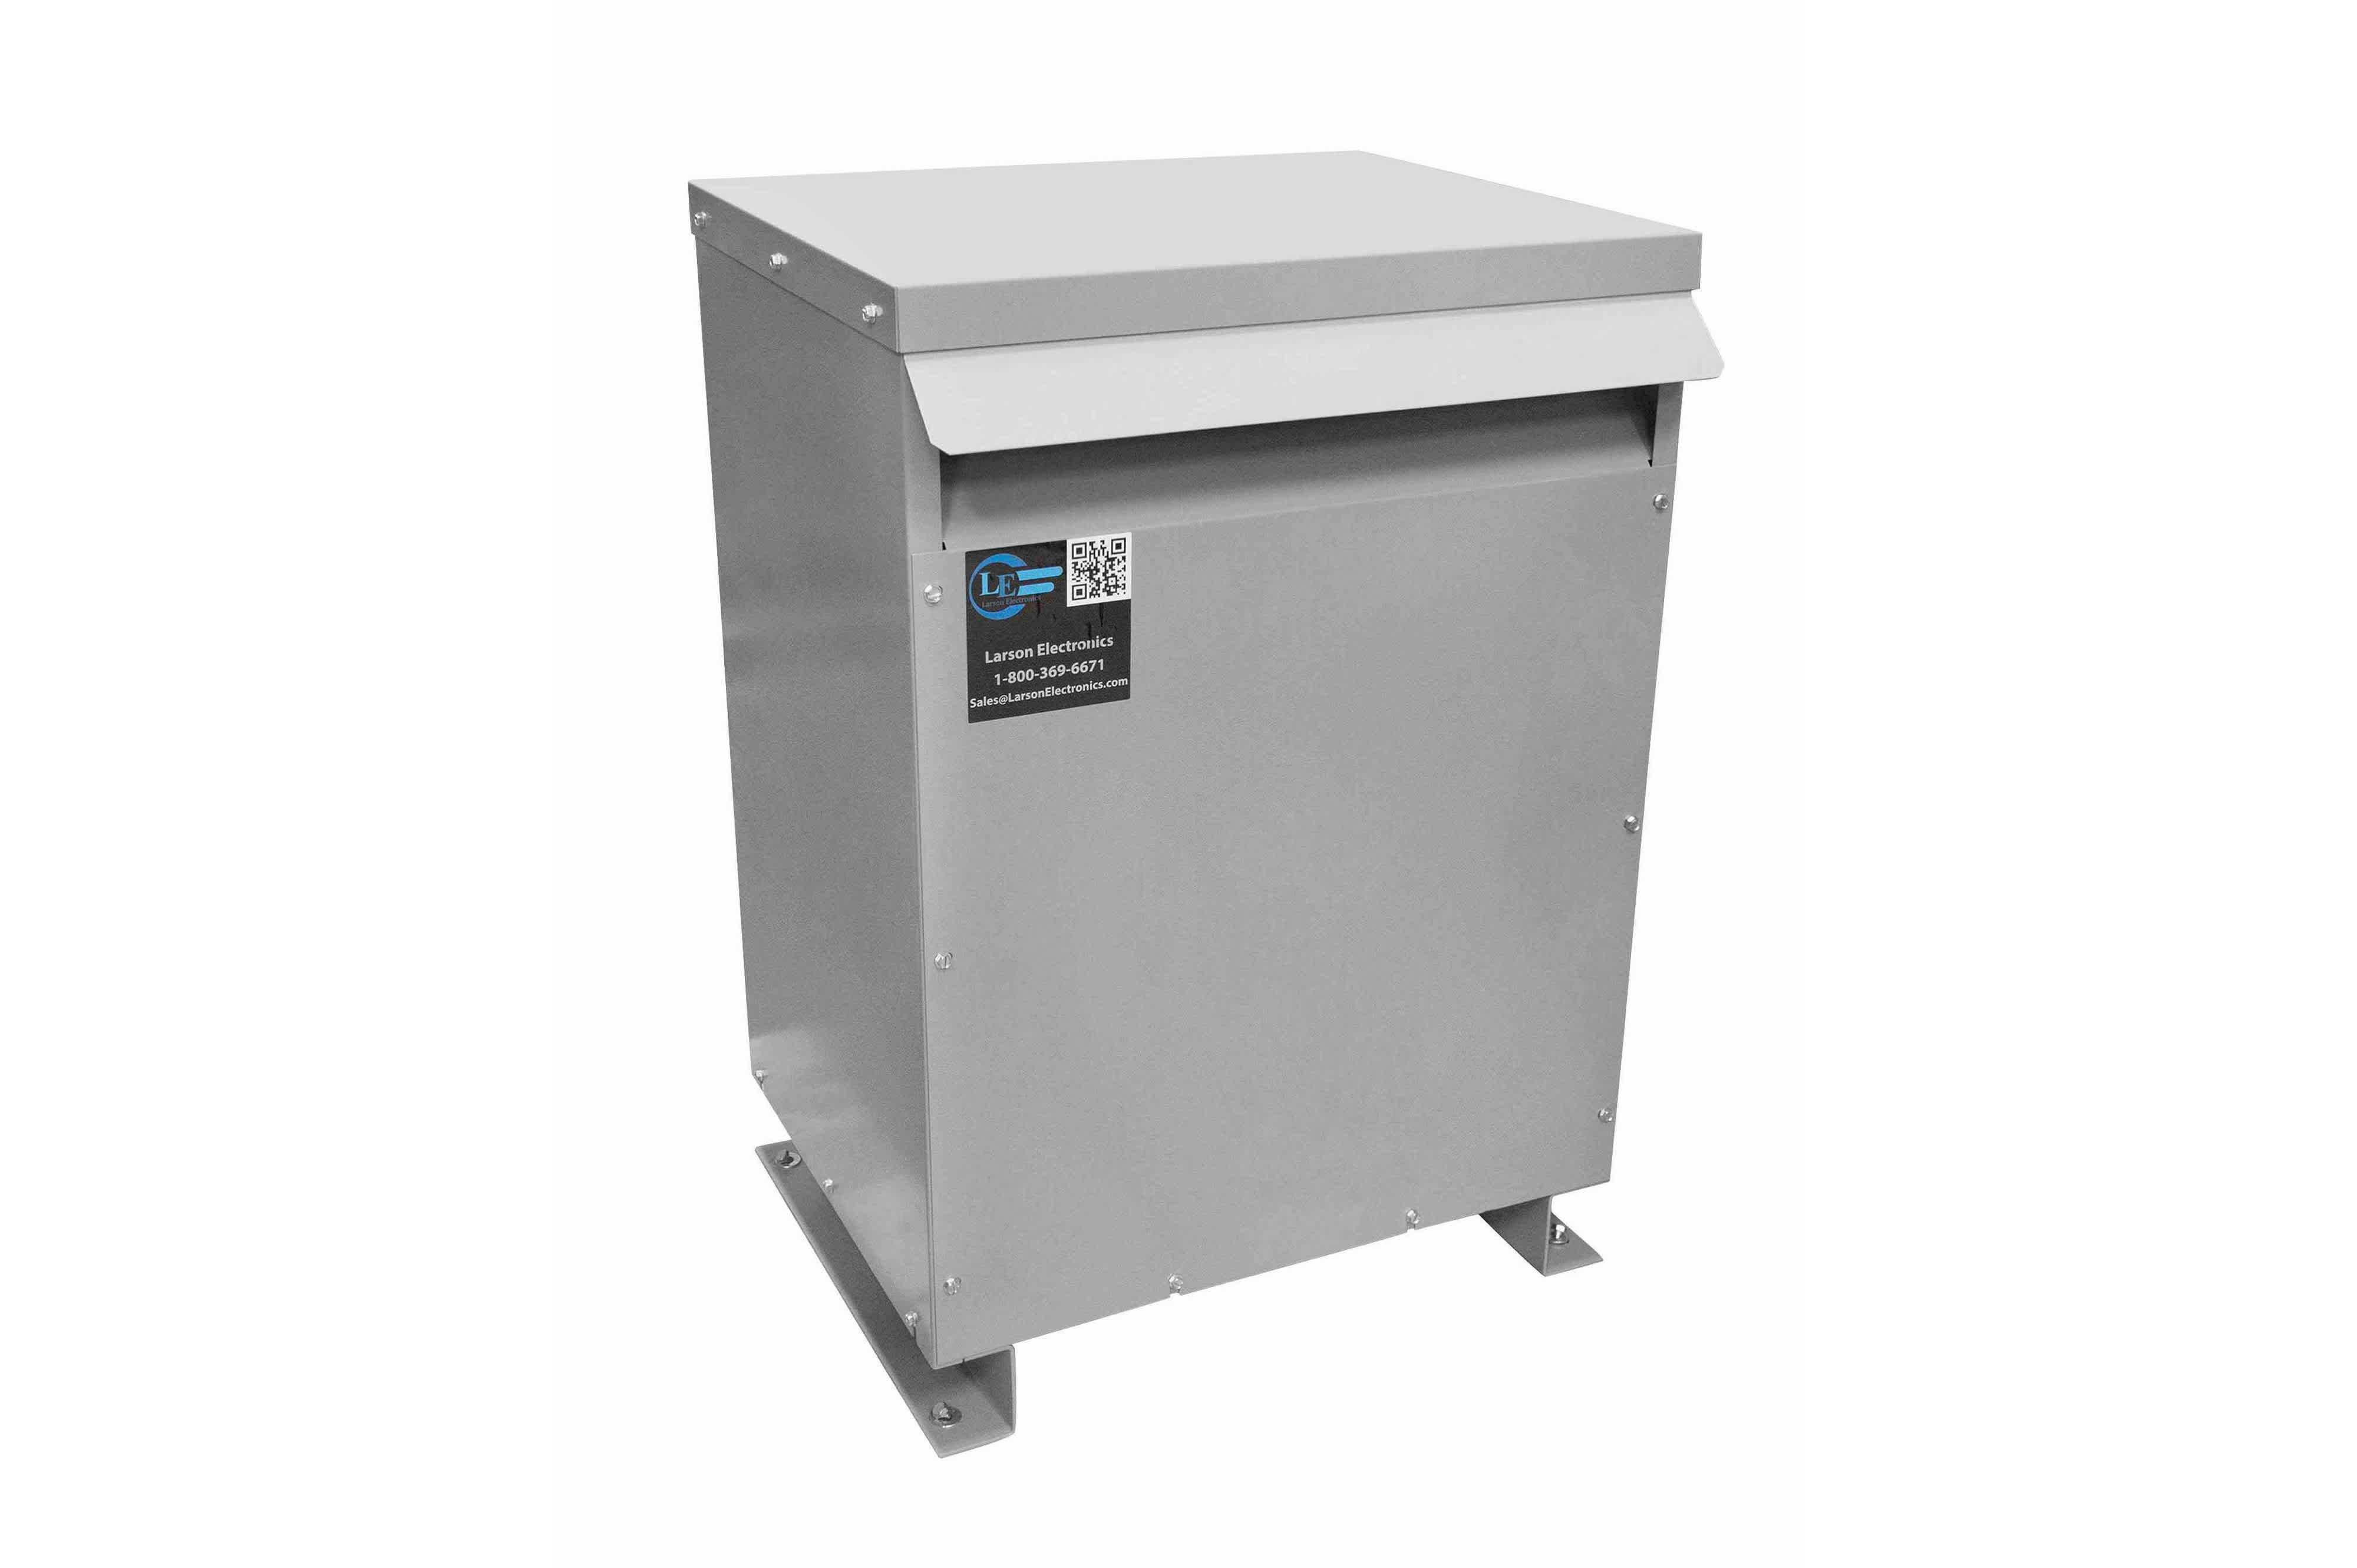 90 kVA 3PH Isolation Transformer, 240V Wye Primary, 208V Delta Secondary, N3R, Ventilated, 60 Hz